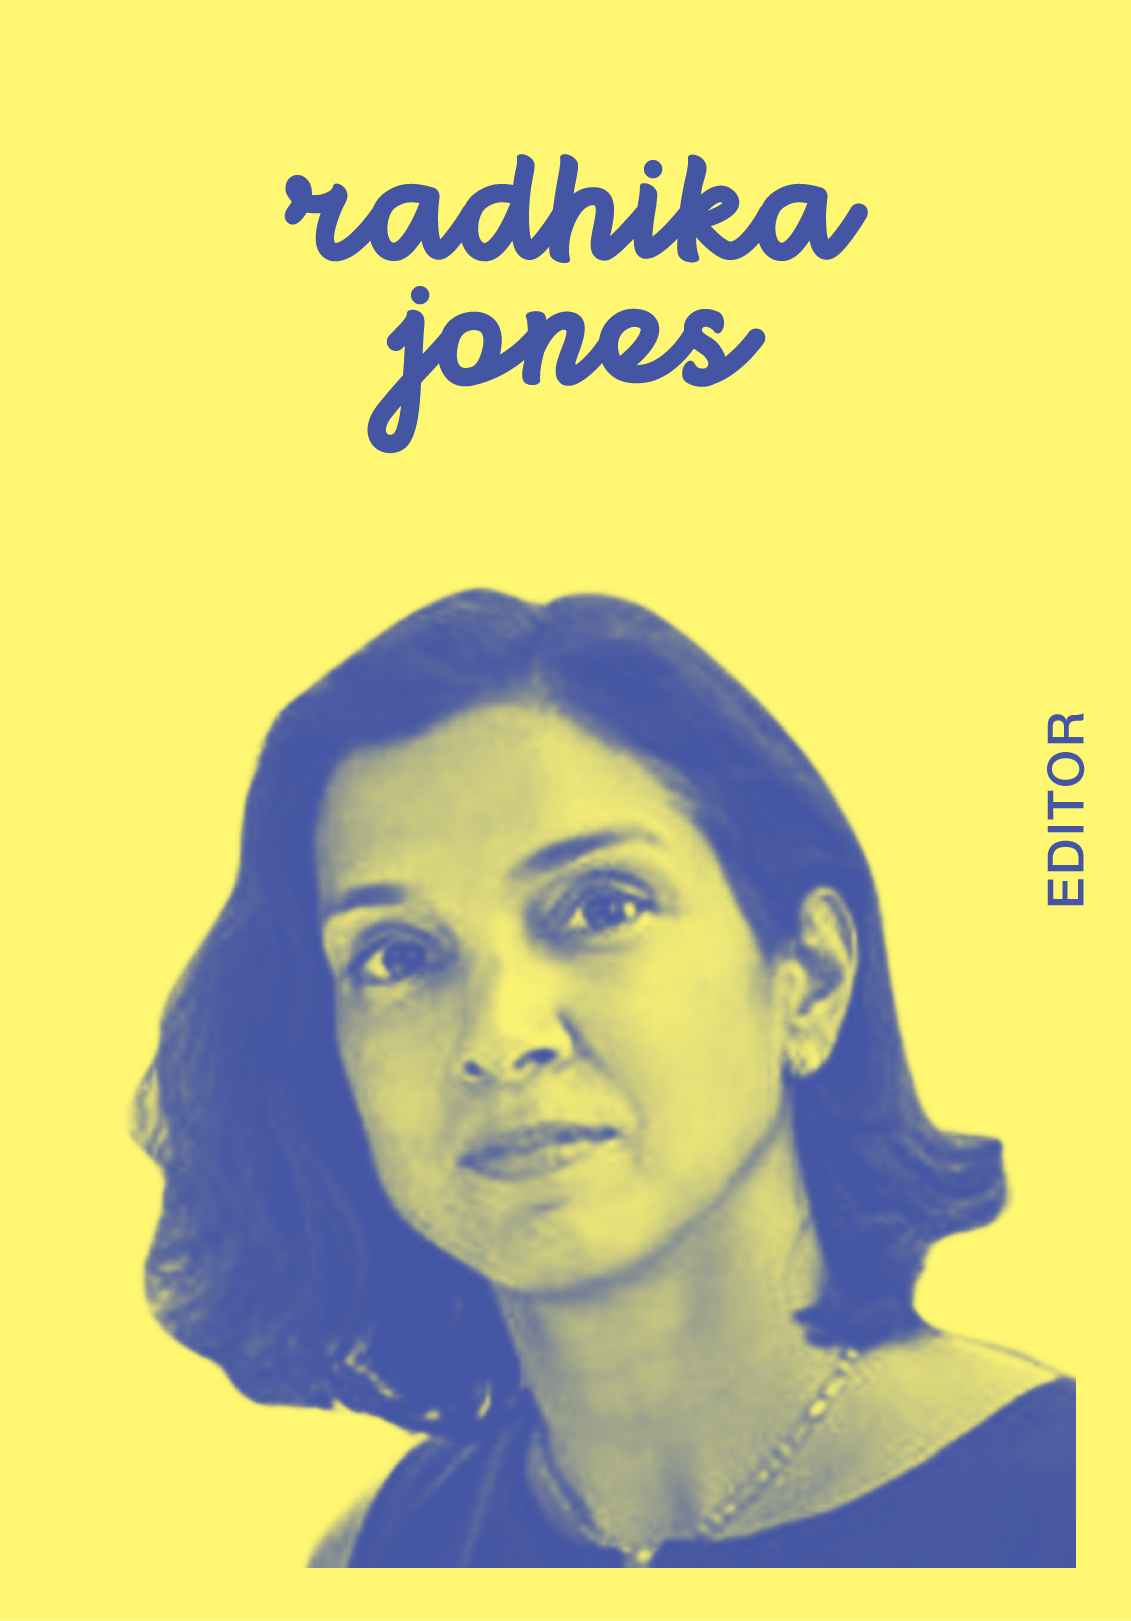 Radhika Jones   @RADHIKAJONES   IG: RADHIKAJONES